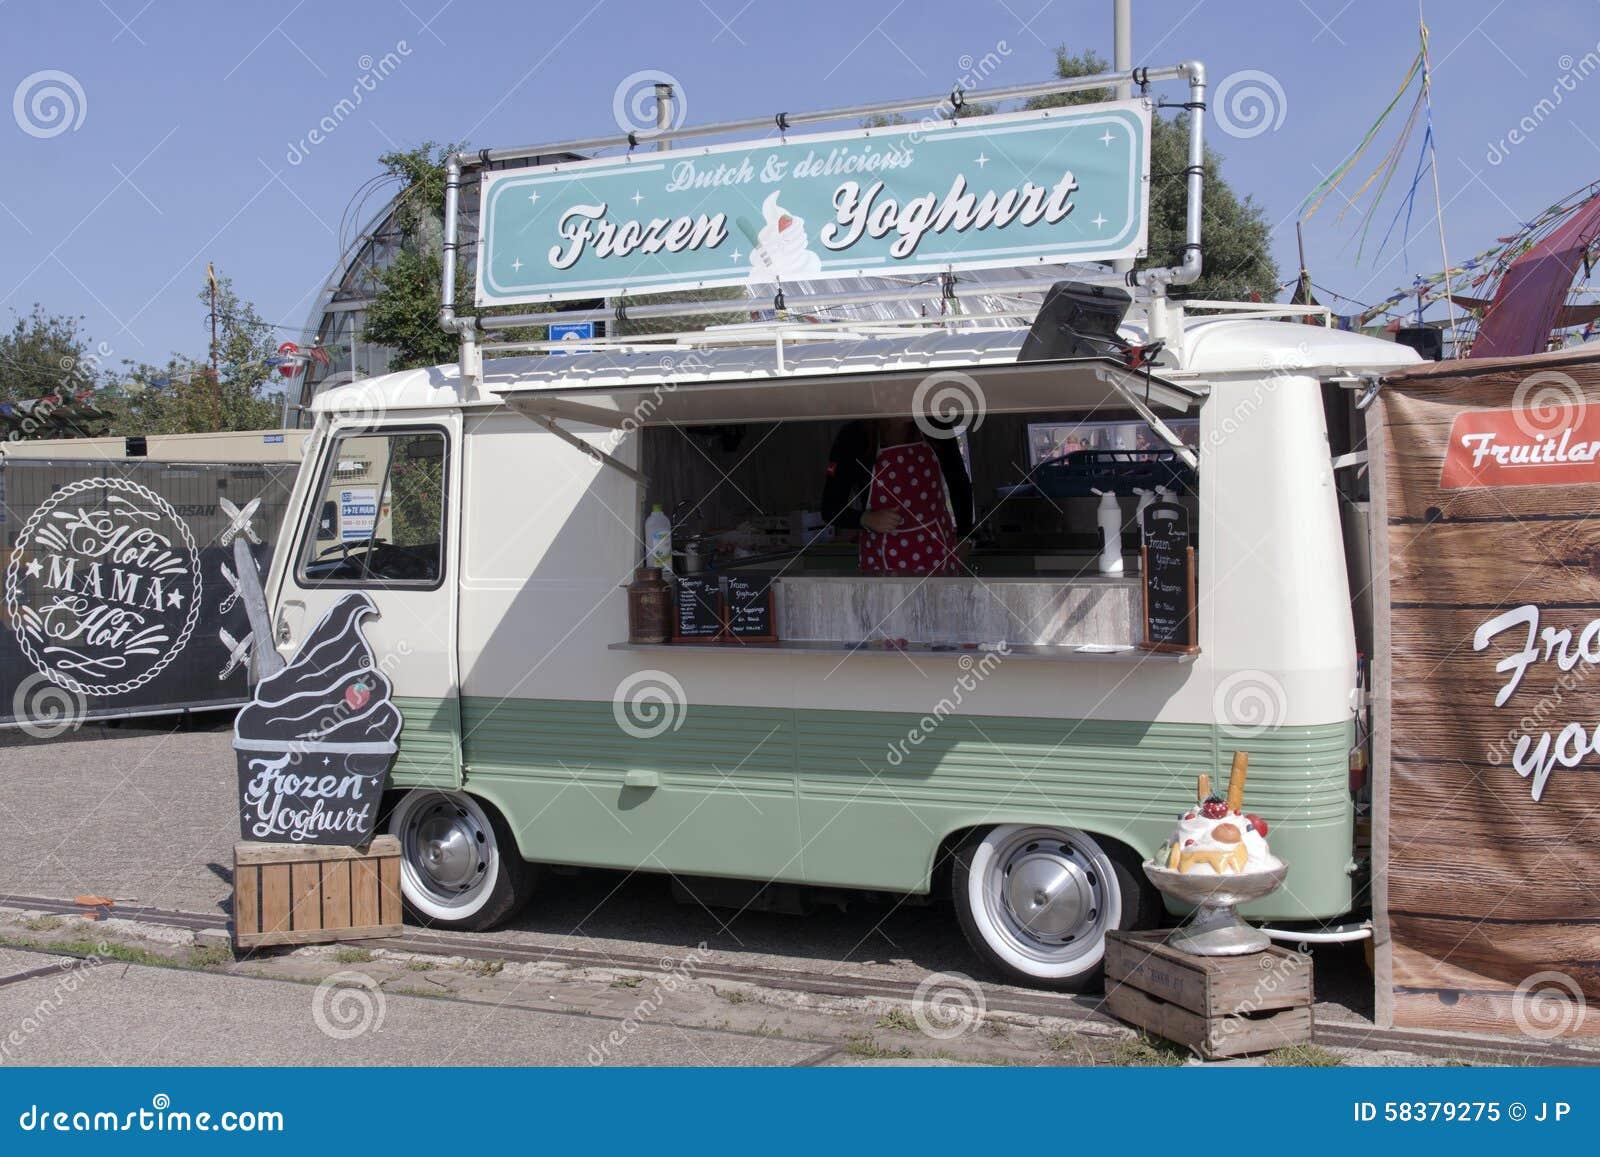 Frozen yoghurt editorial image image 58379275 for Food truck design app